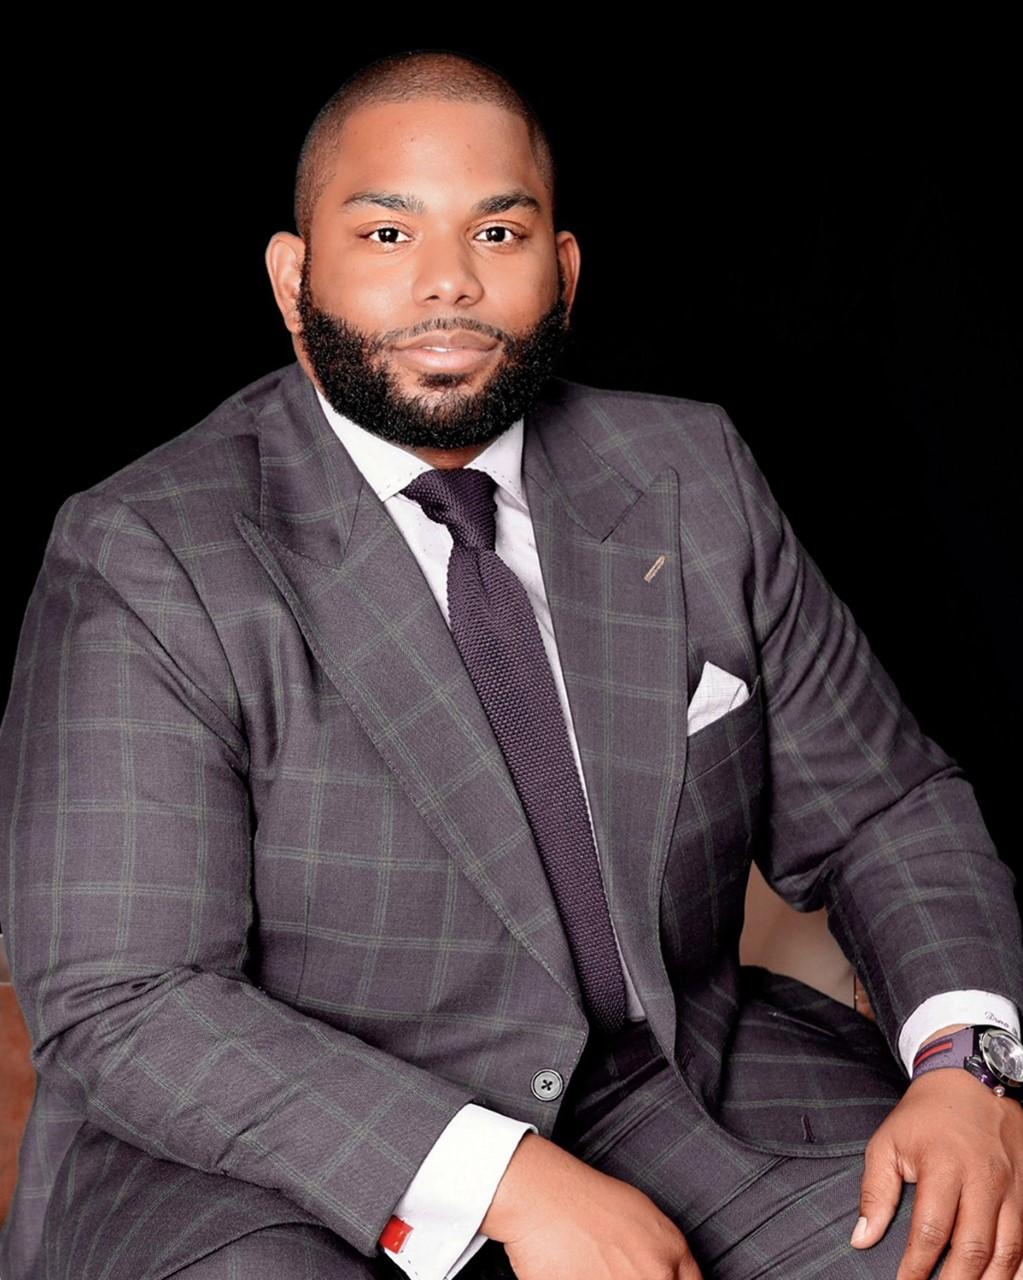 Rev. Dr. Drew Kyndall Ross